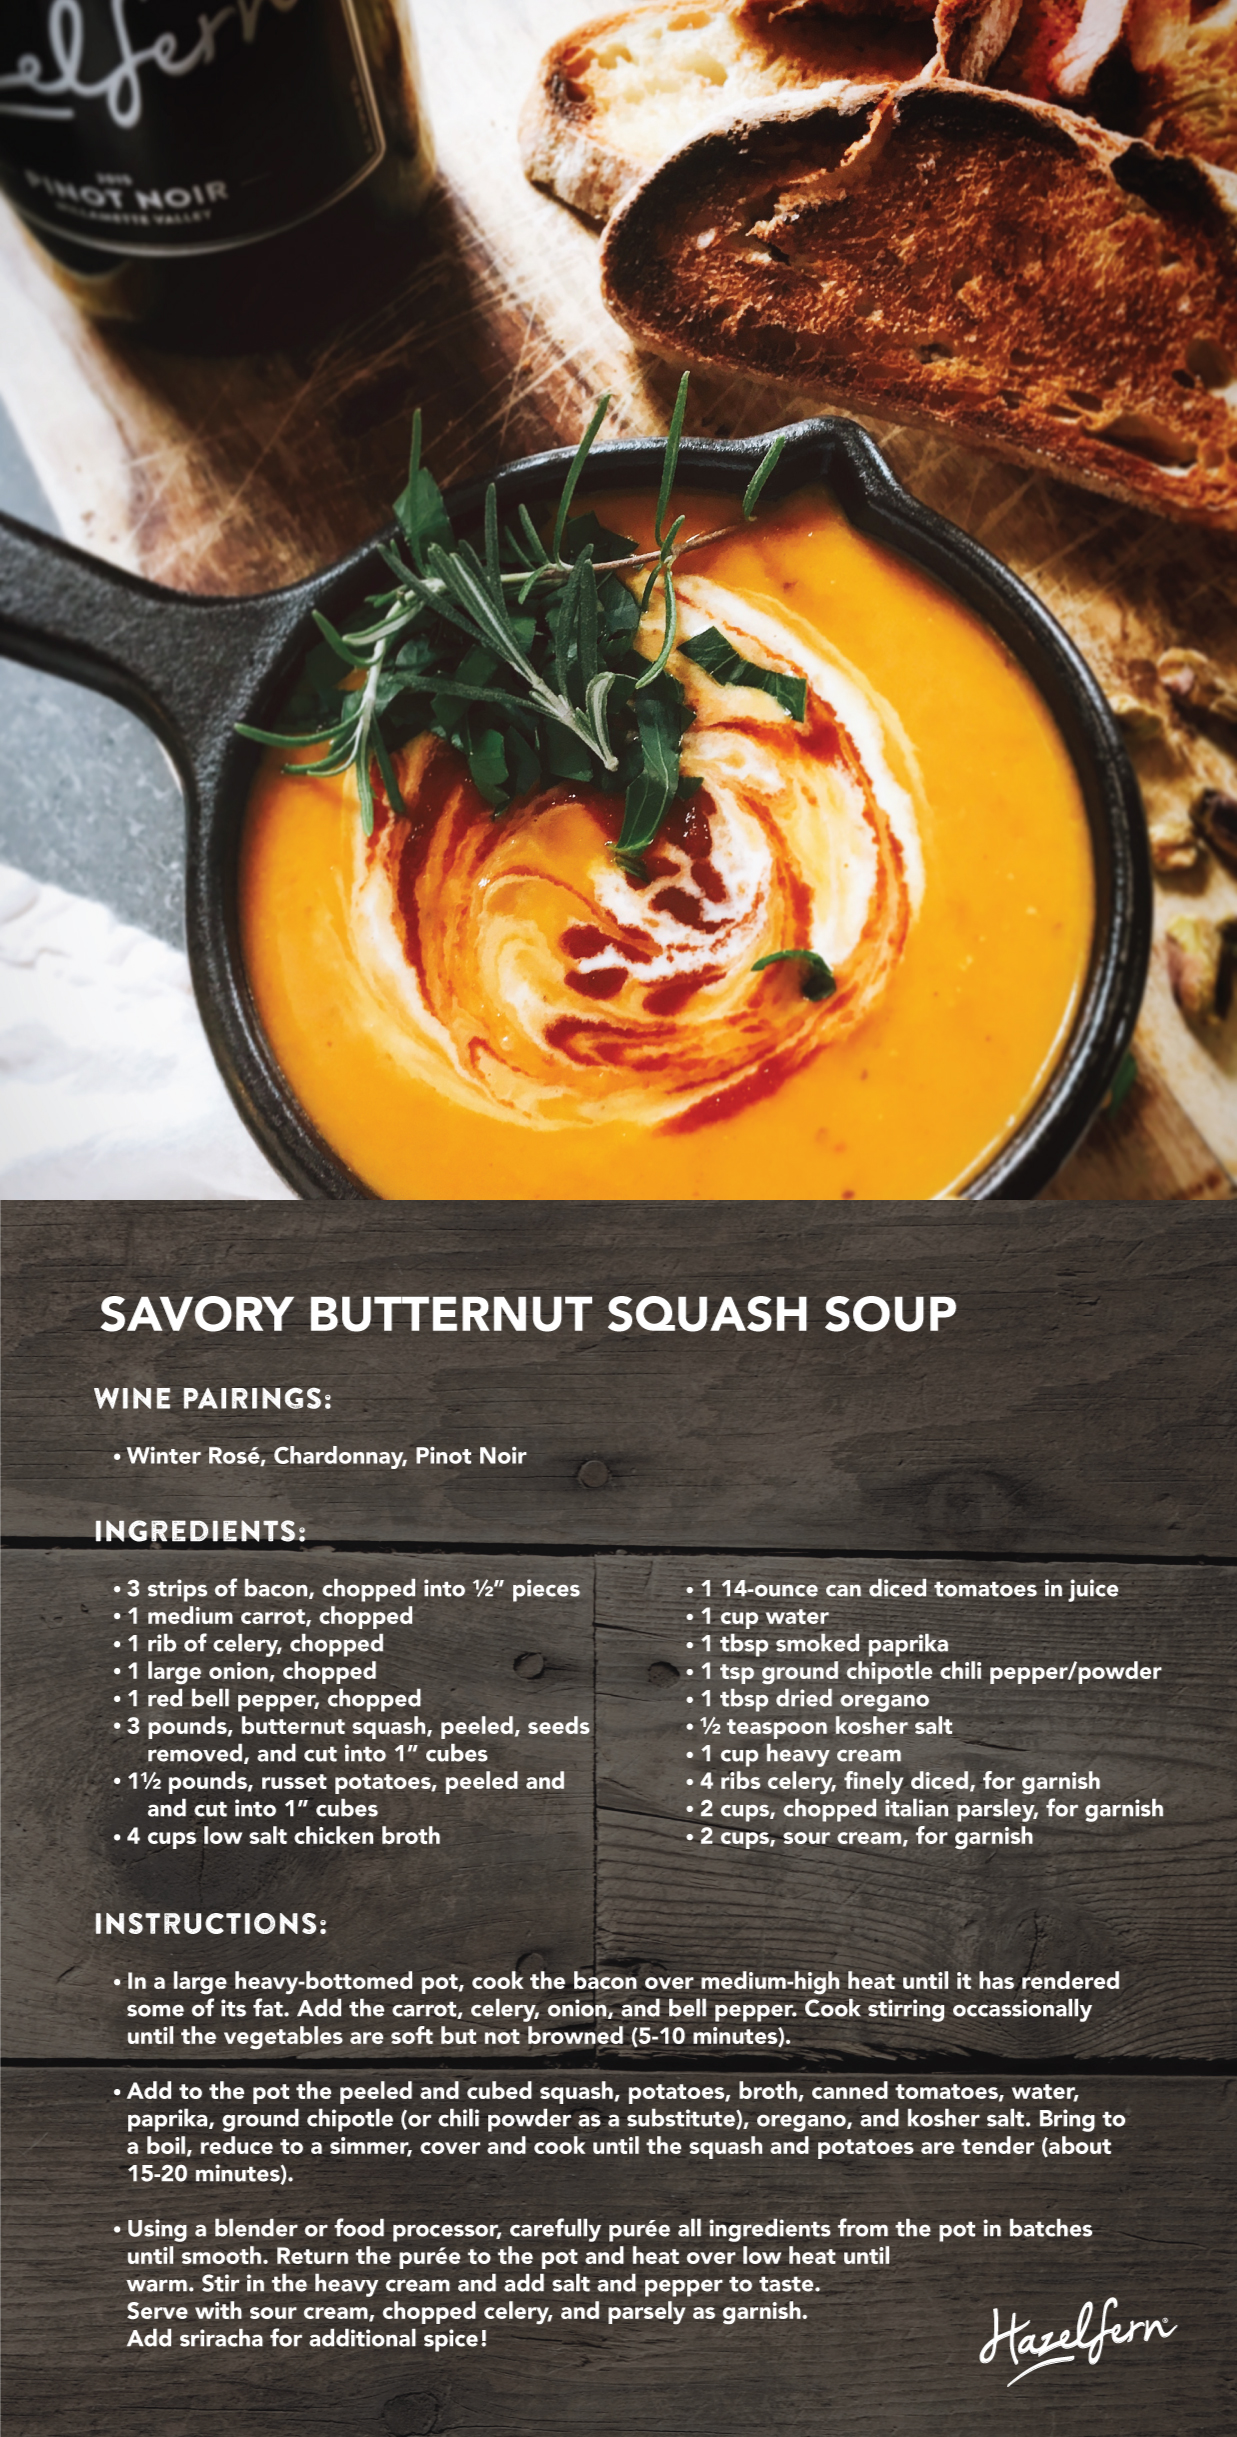 Savory Butternut Squash Soup Pinterest Layout-01.jpg